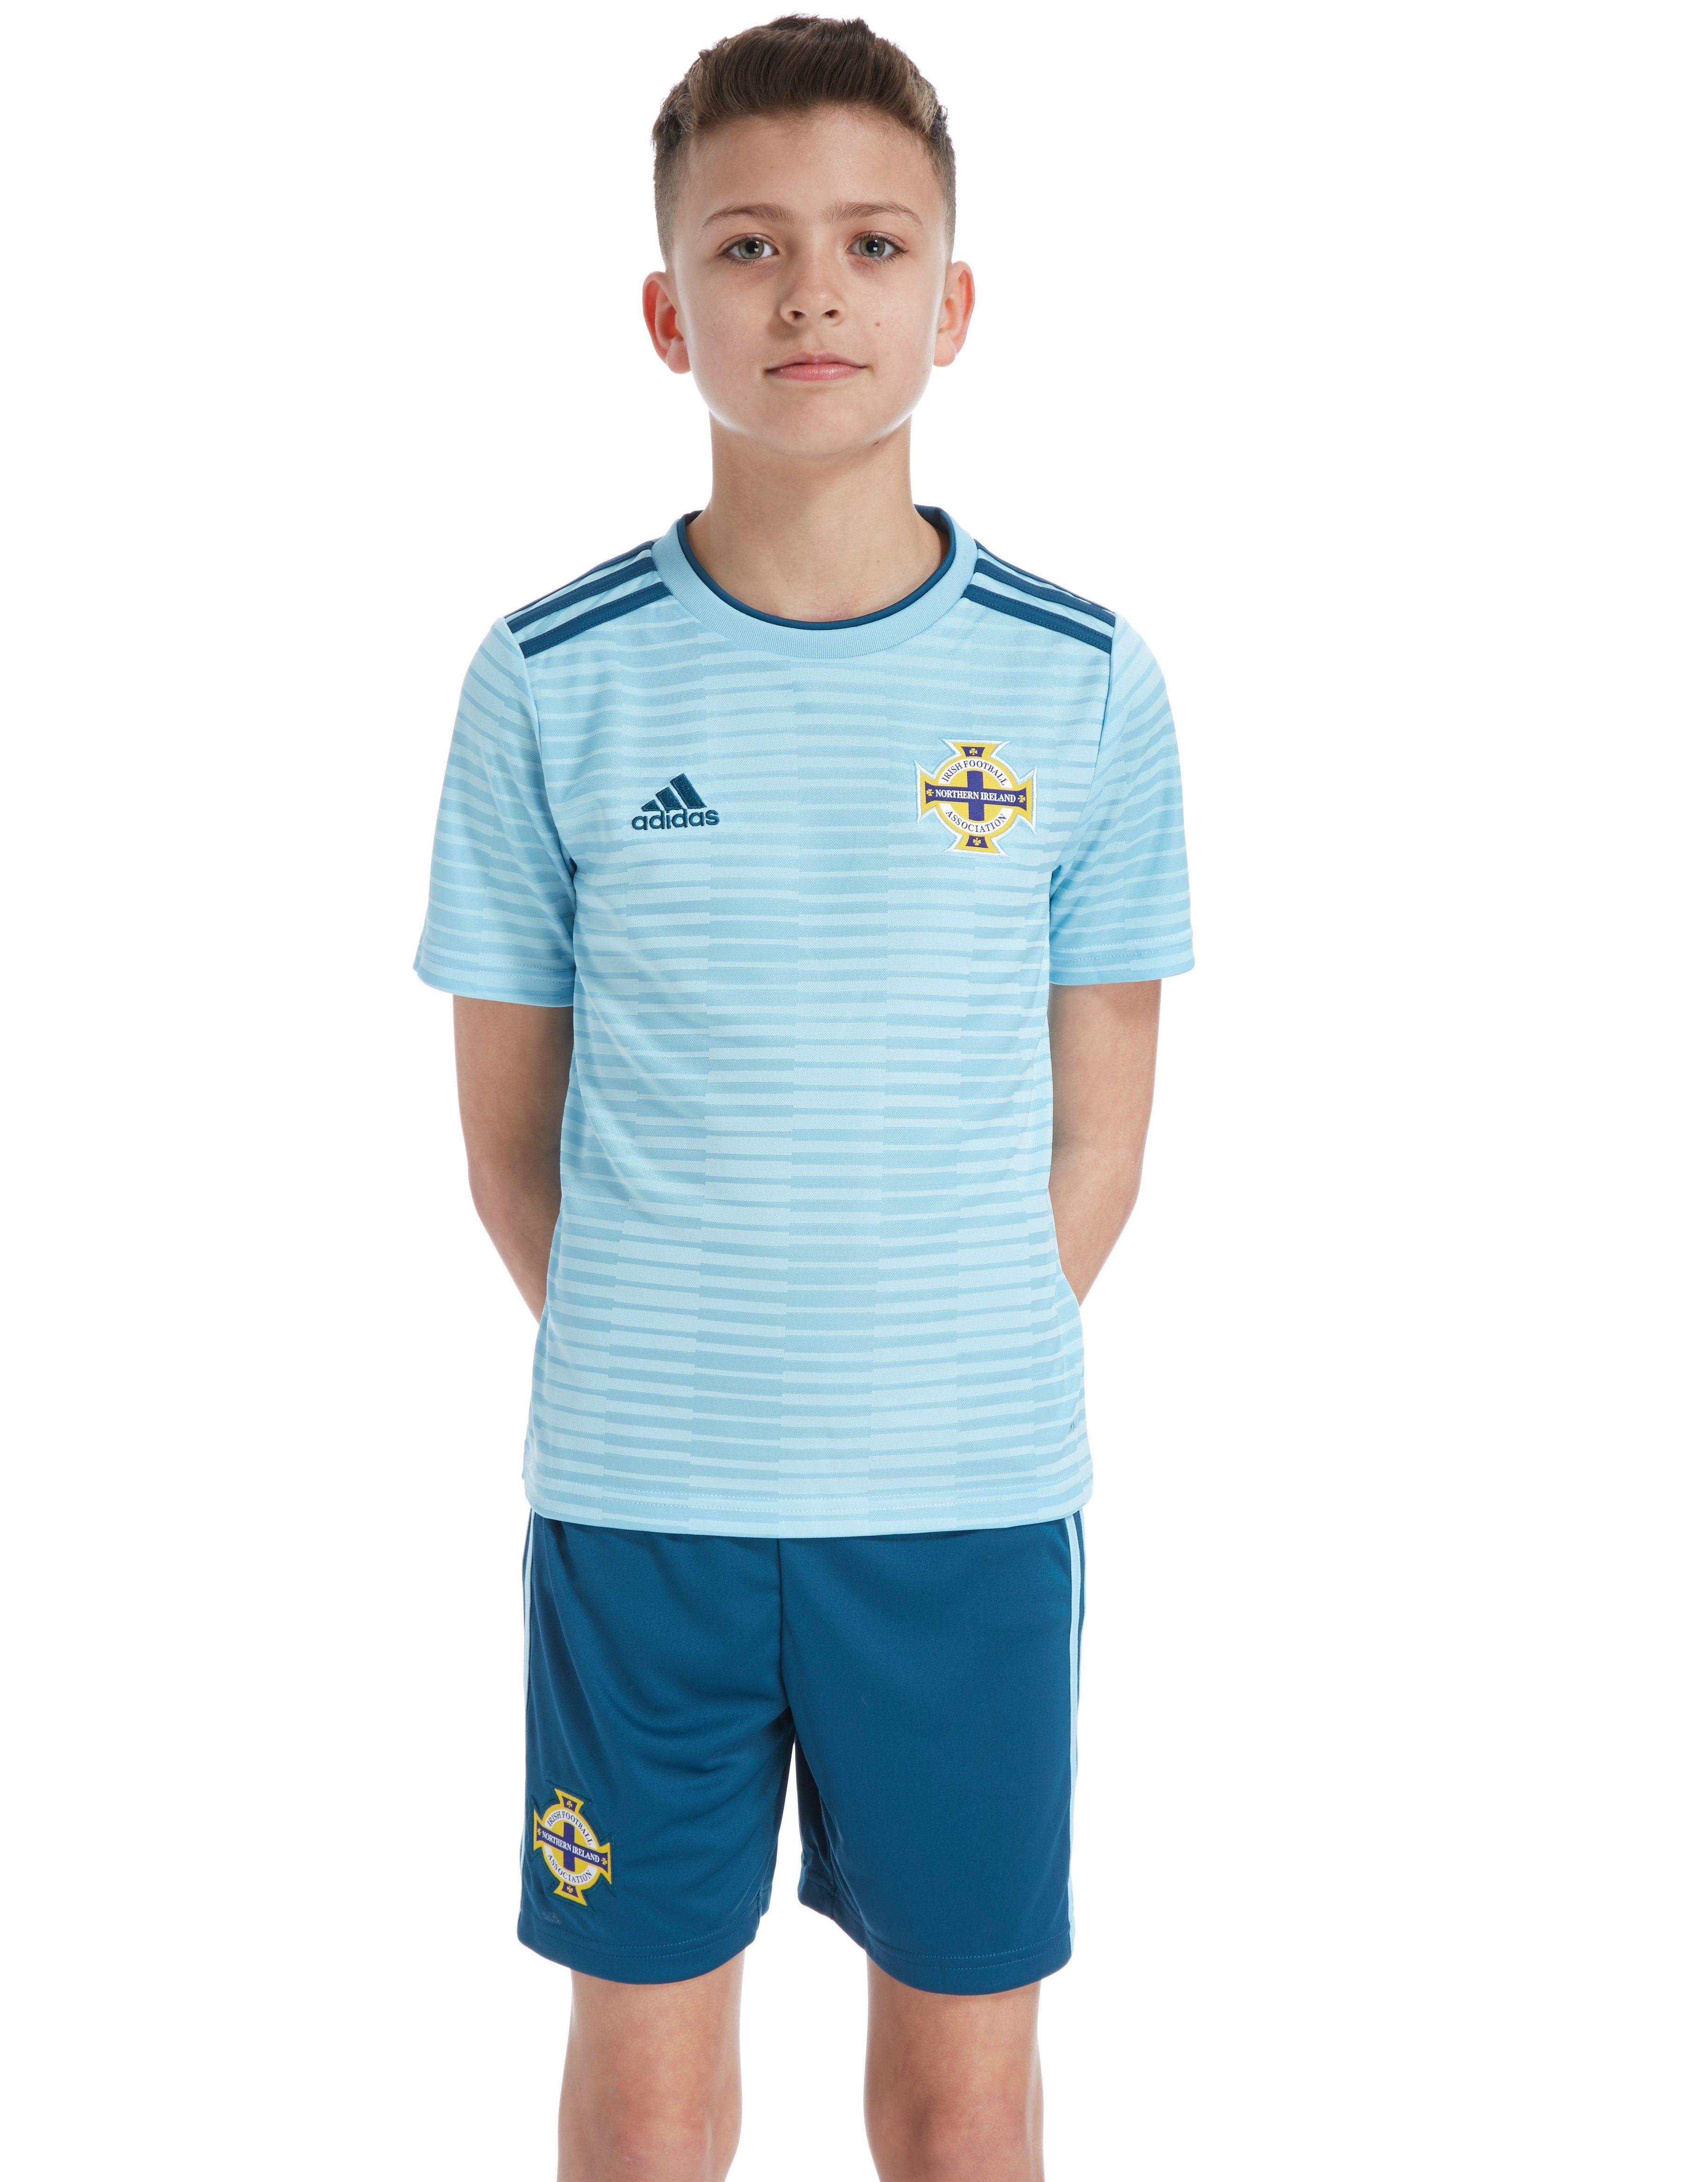 adidas Northern Ireland 2018/19 Away Shirt Junior